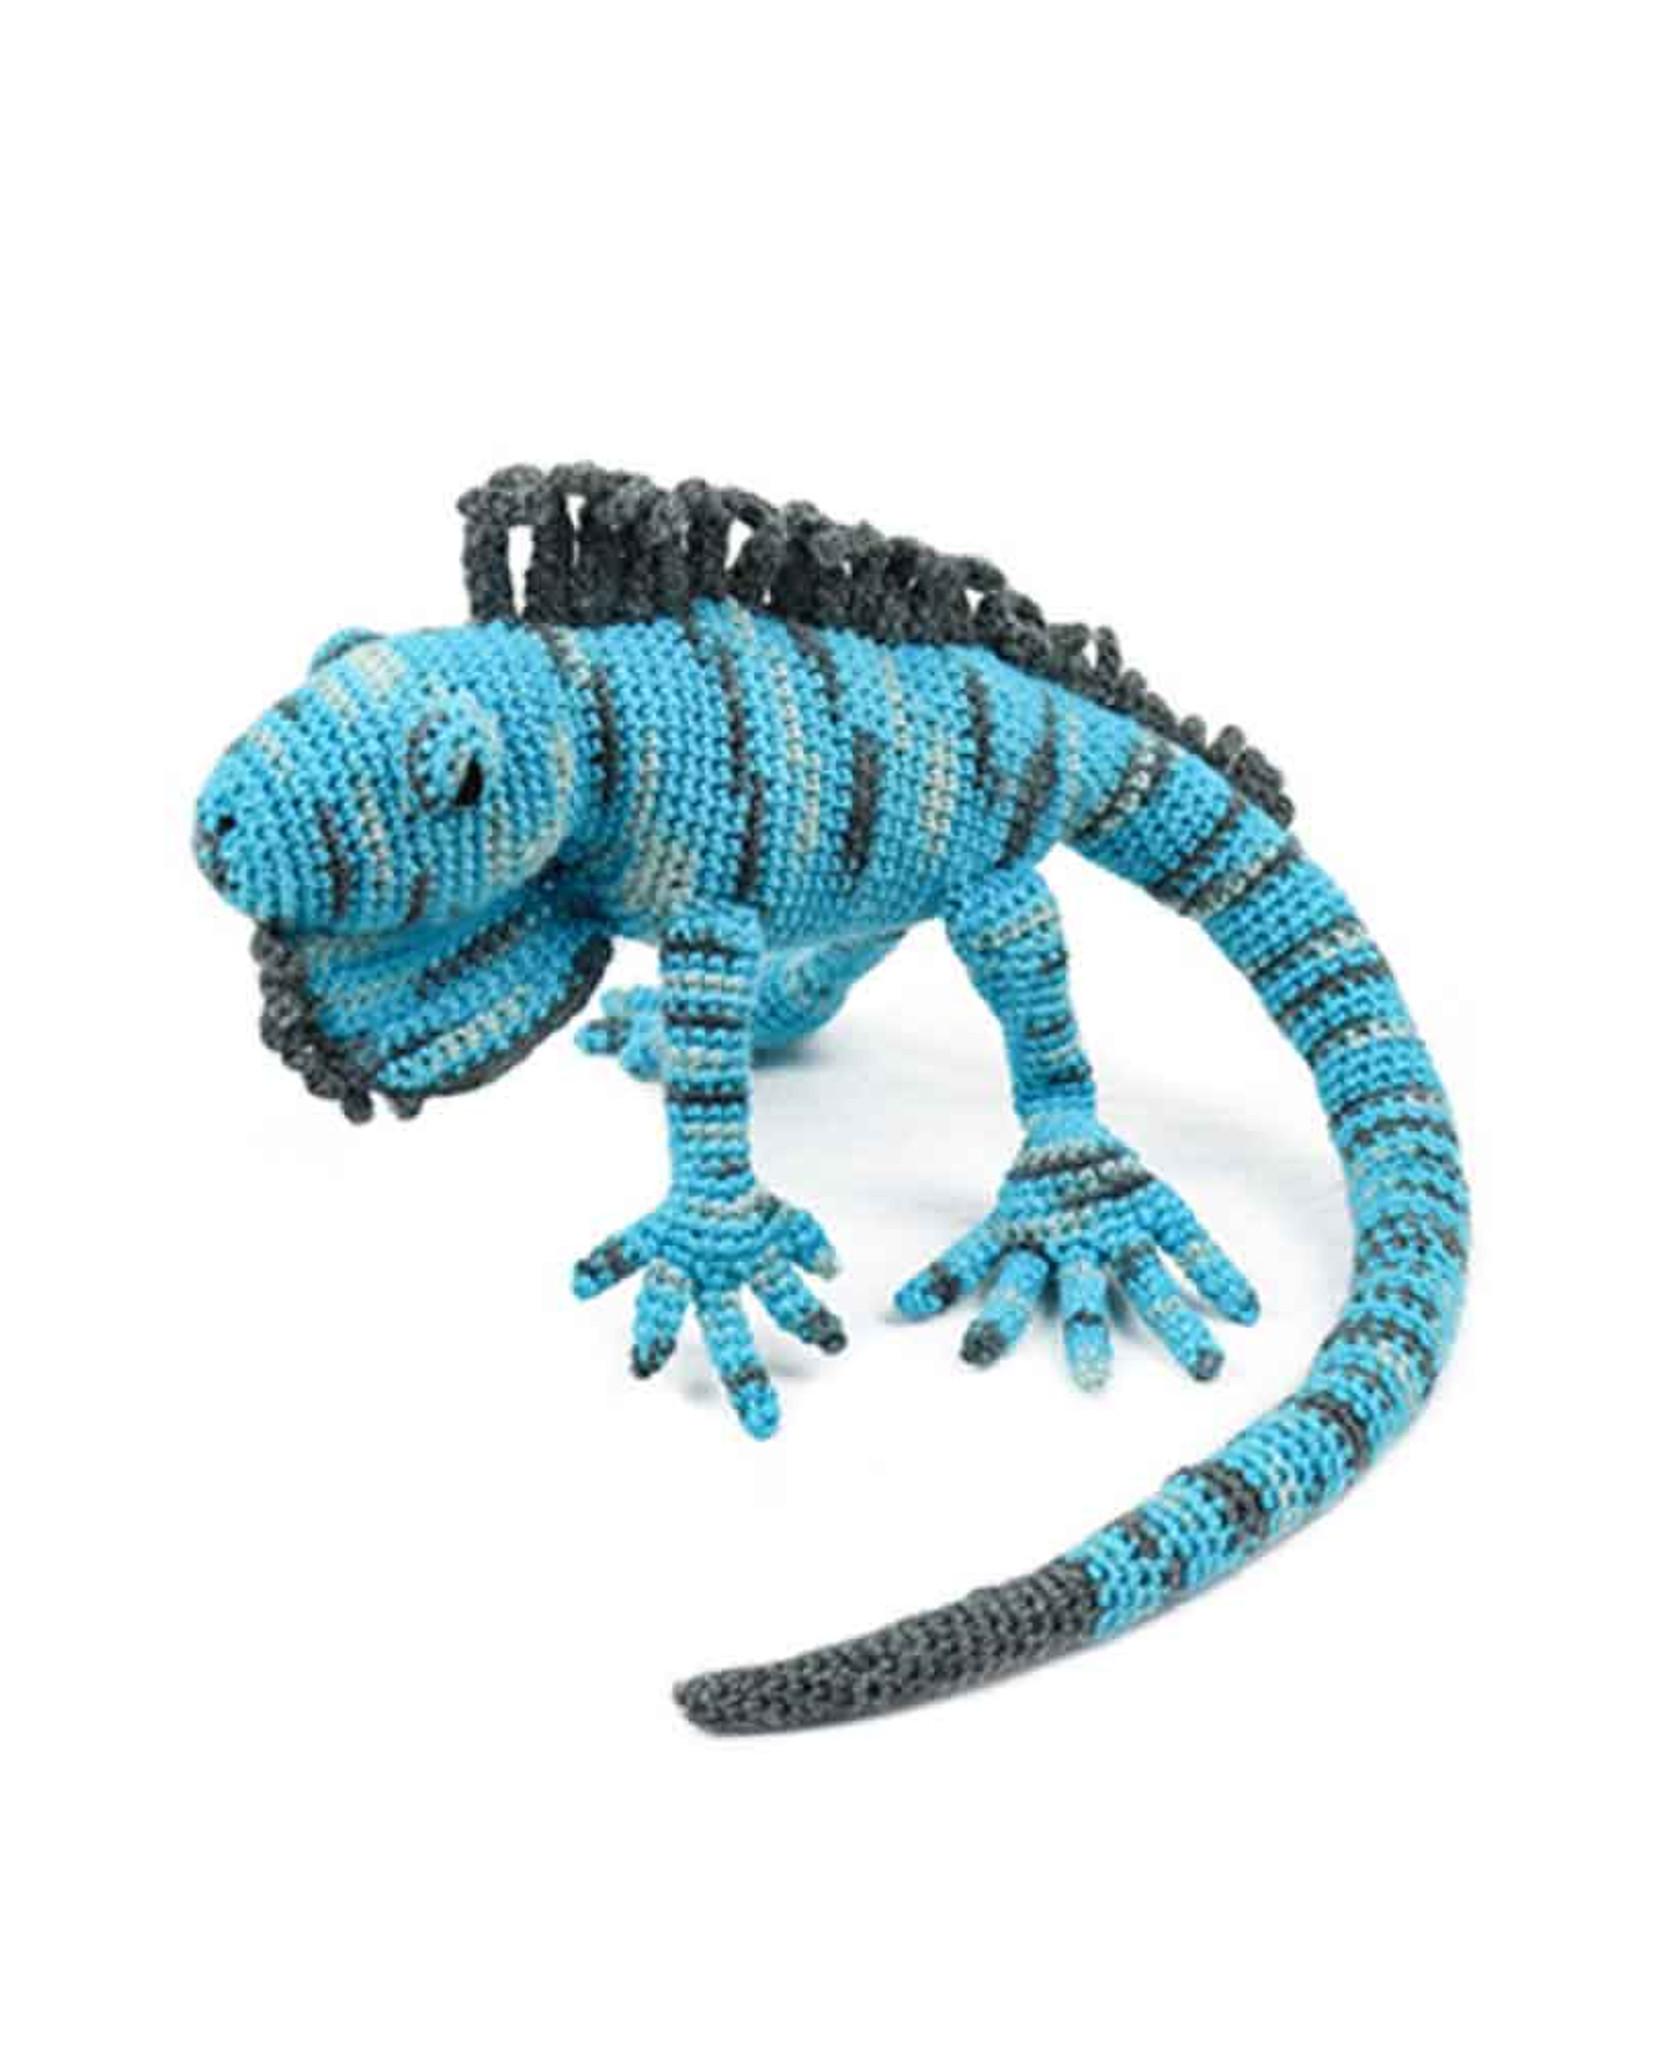 Toft Amigurumi Crochet Kits | Edward's Menagerie Animals | Kerry Lord |  Euripides the Iguana